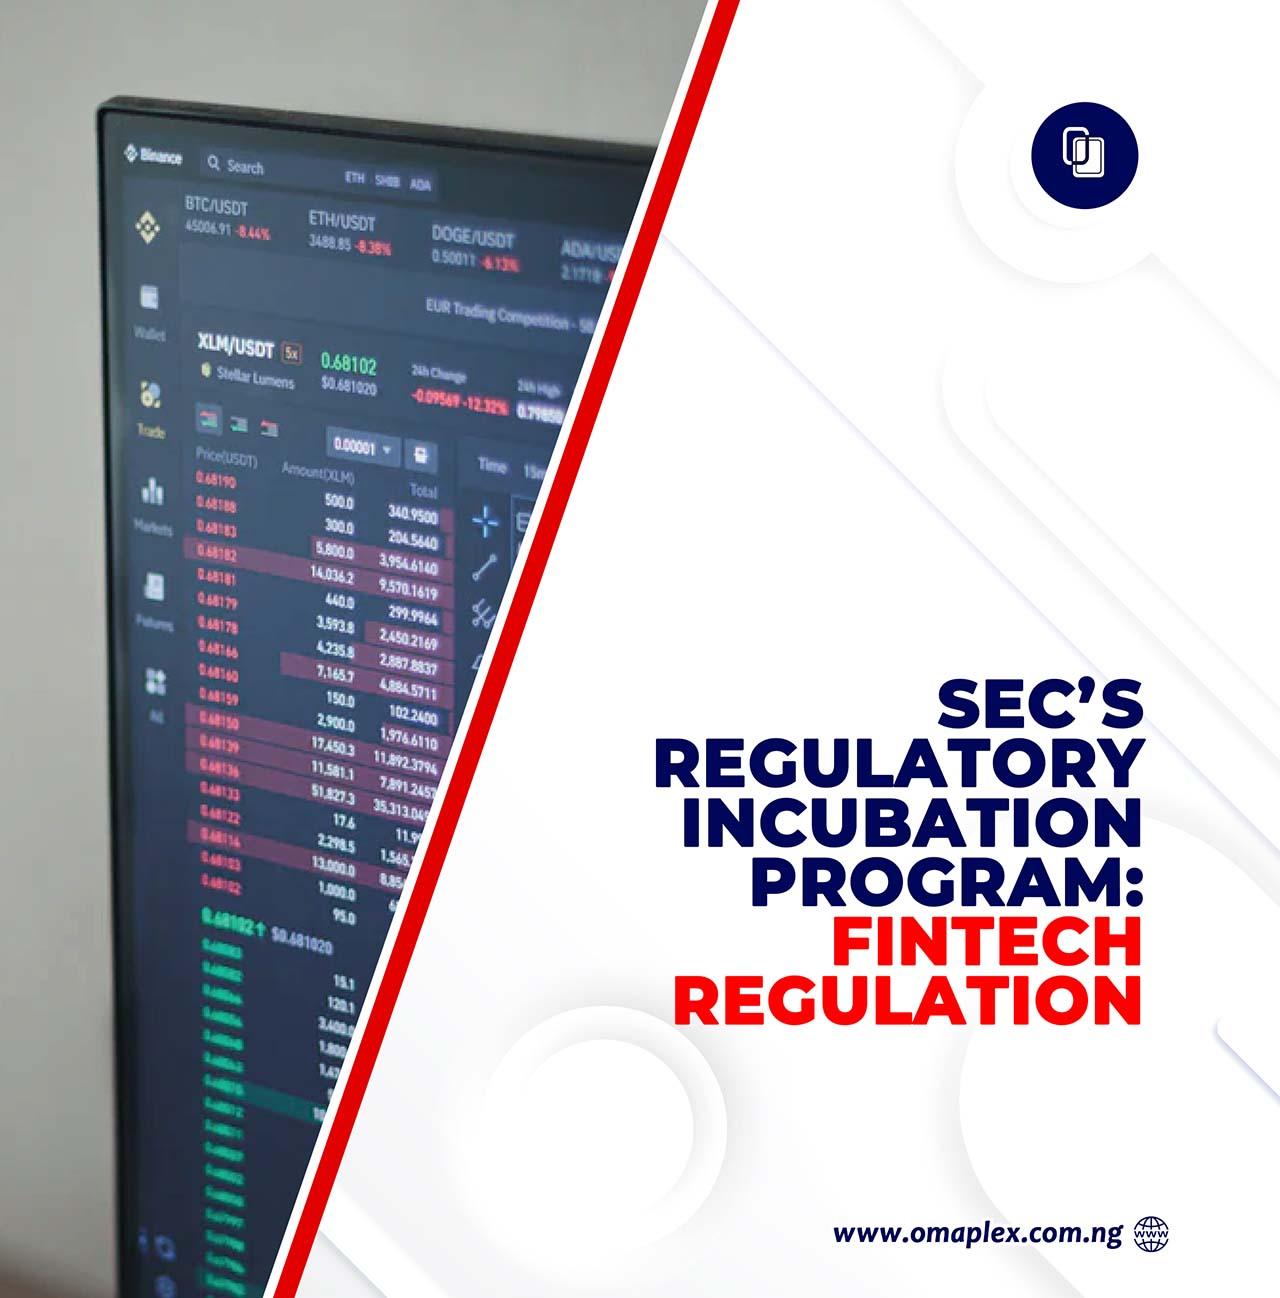 SEC's Regulatory Incubation Program - Fintech Regulation